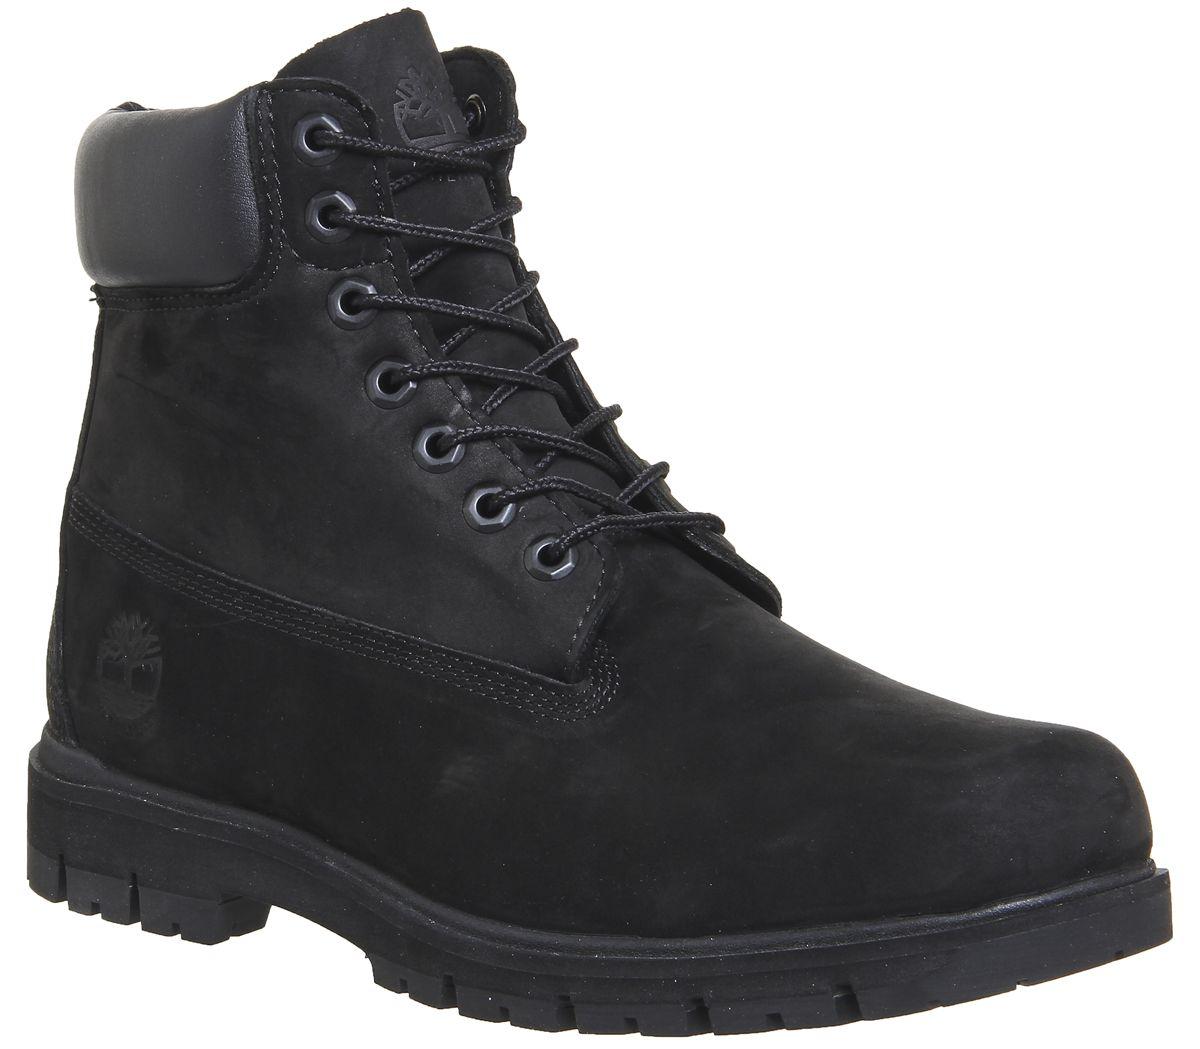 2f01ec7b6564e Timberland Radford 6 Inch Lite Black - Boots